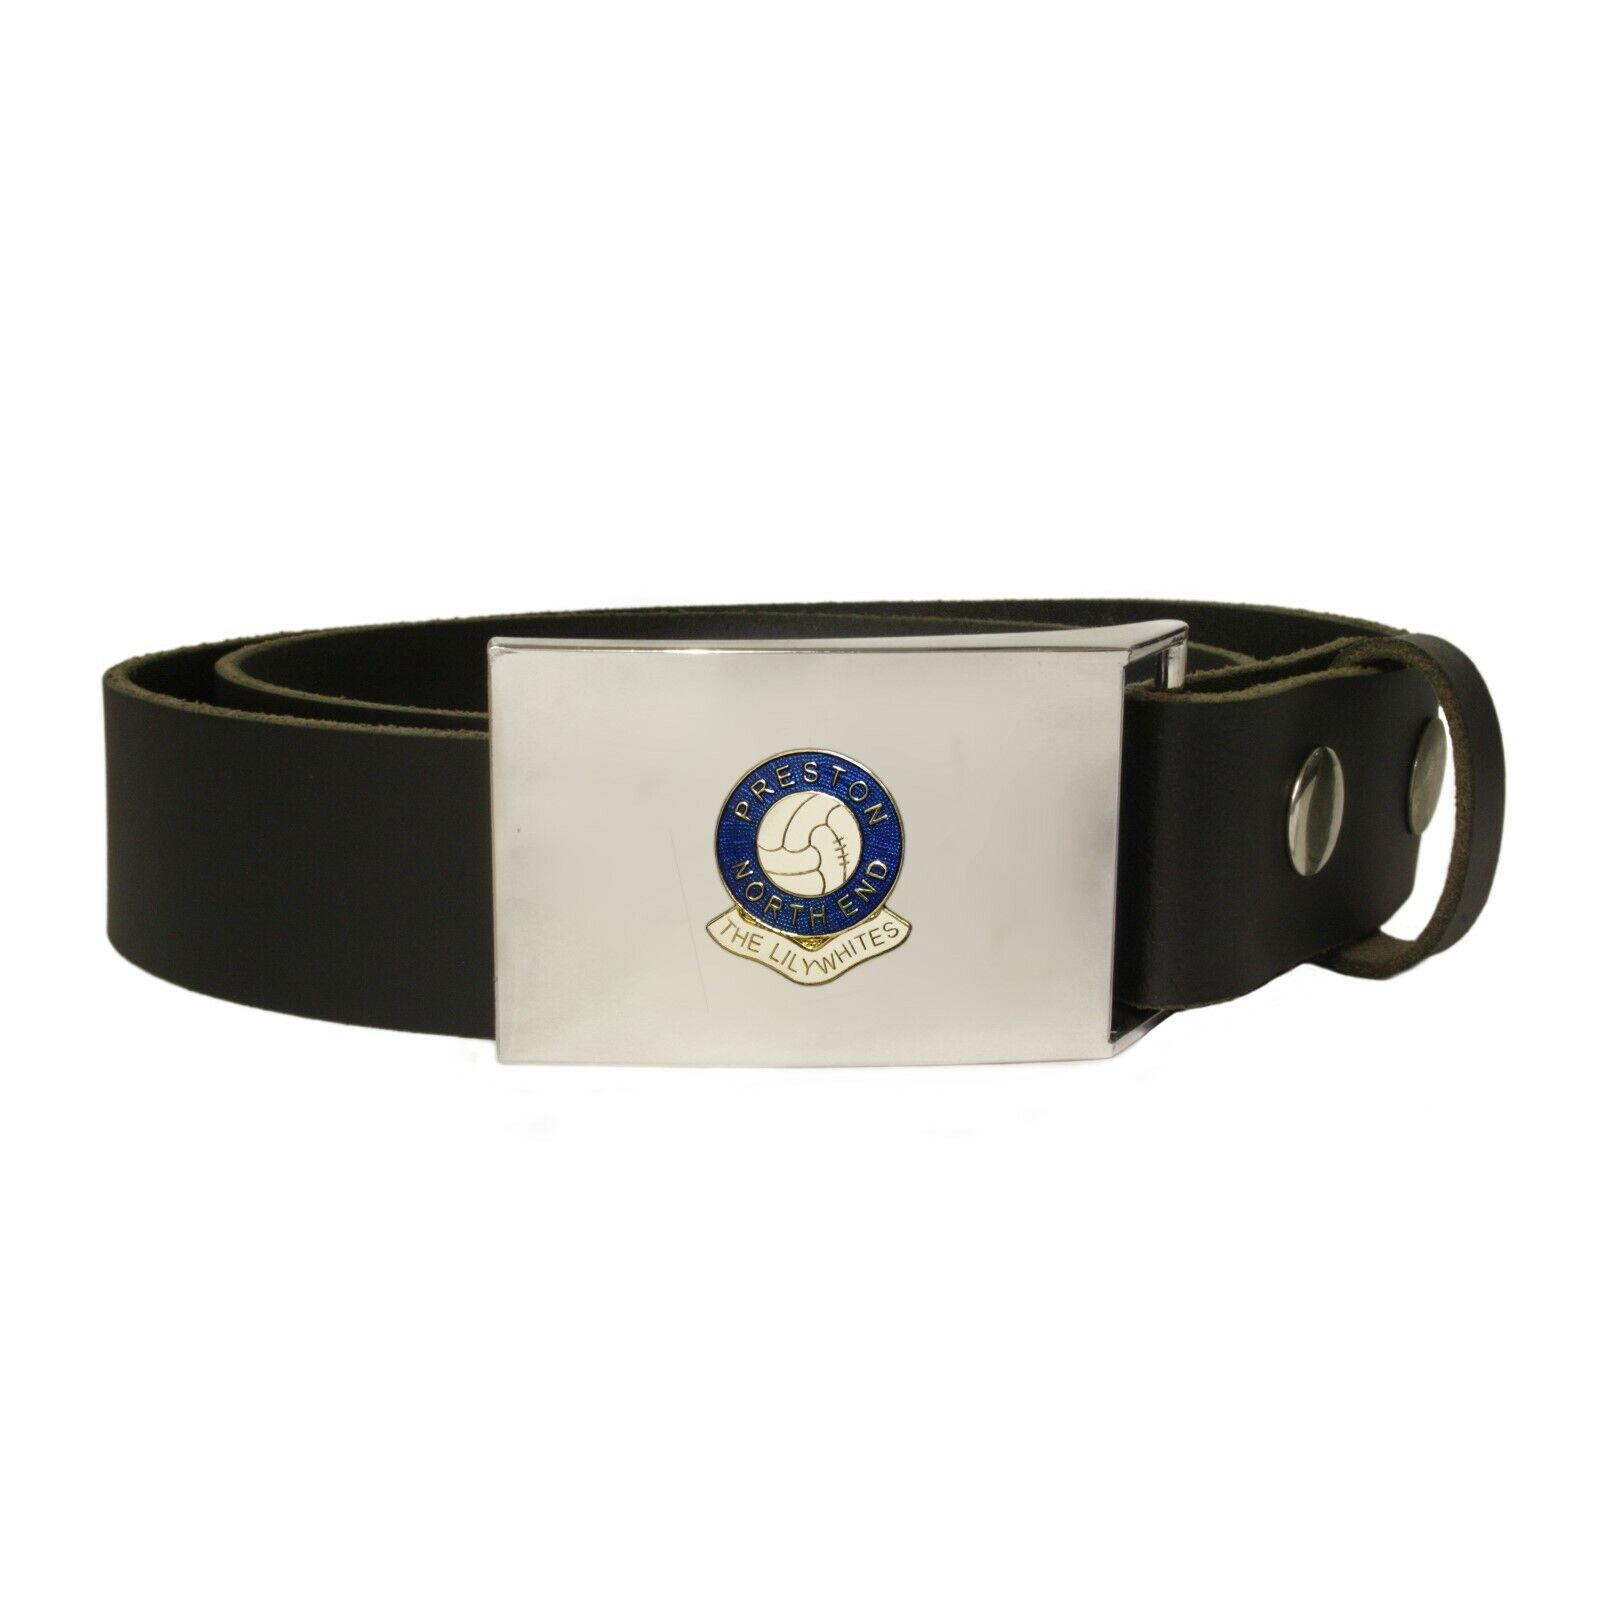 Preston North End football club leather snap fit belt